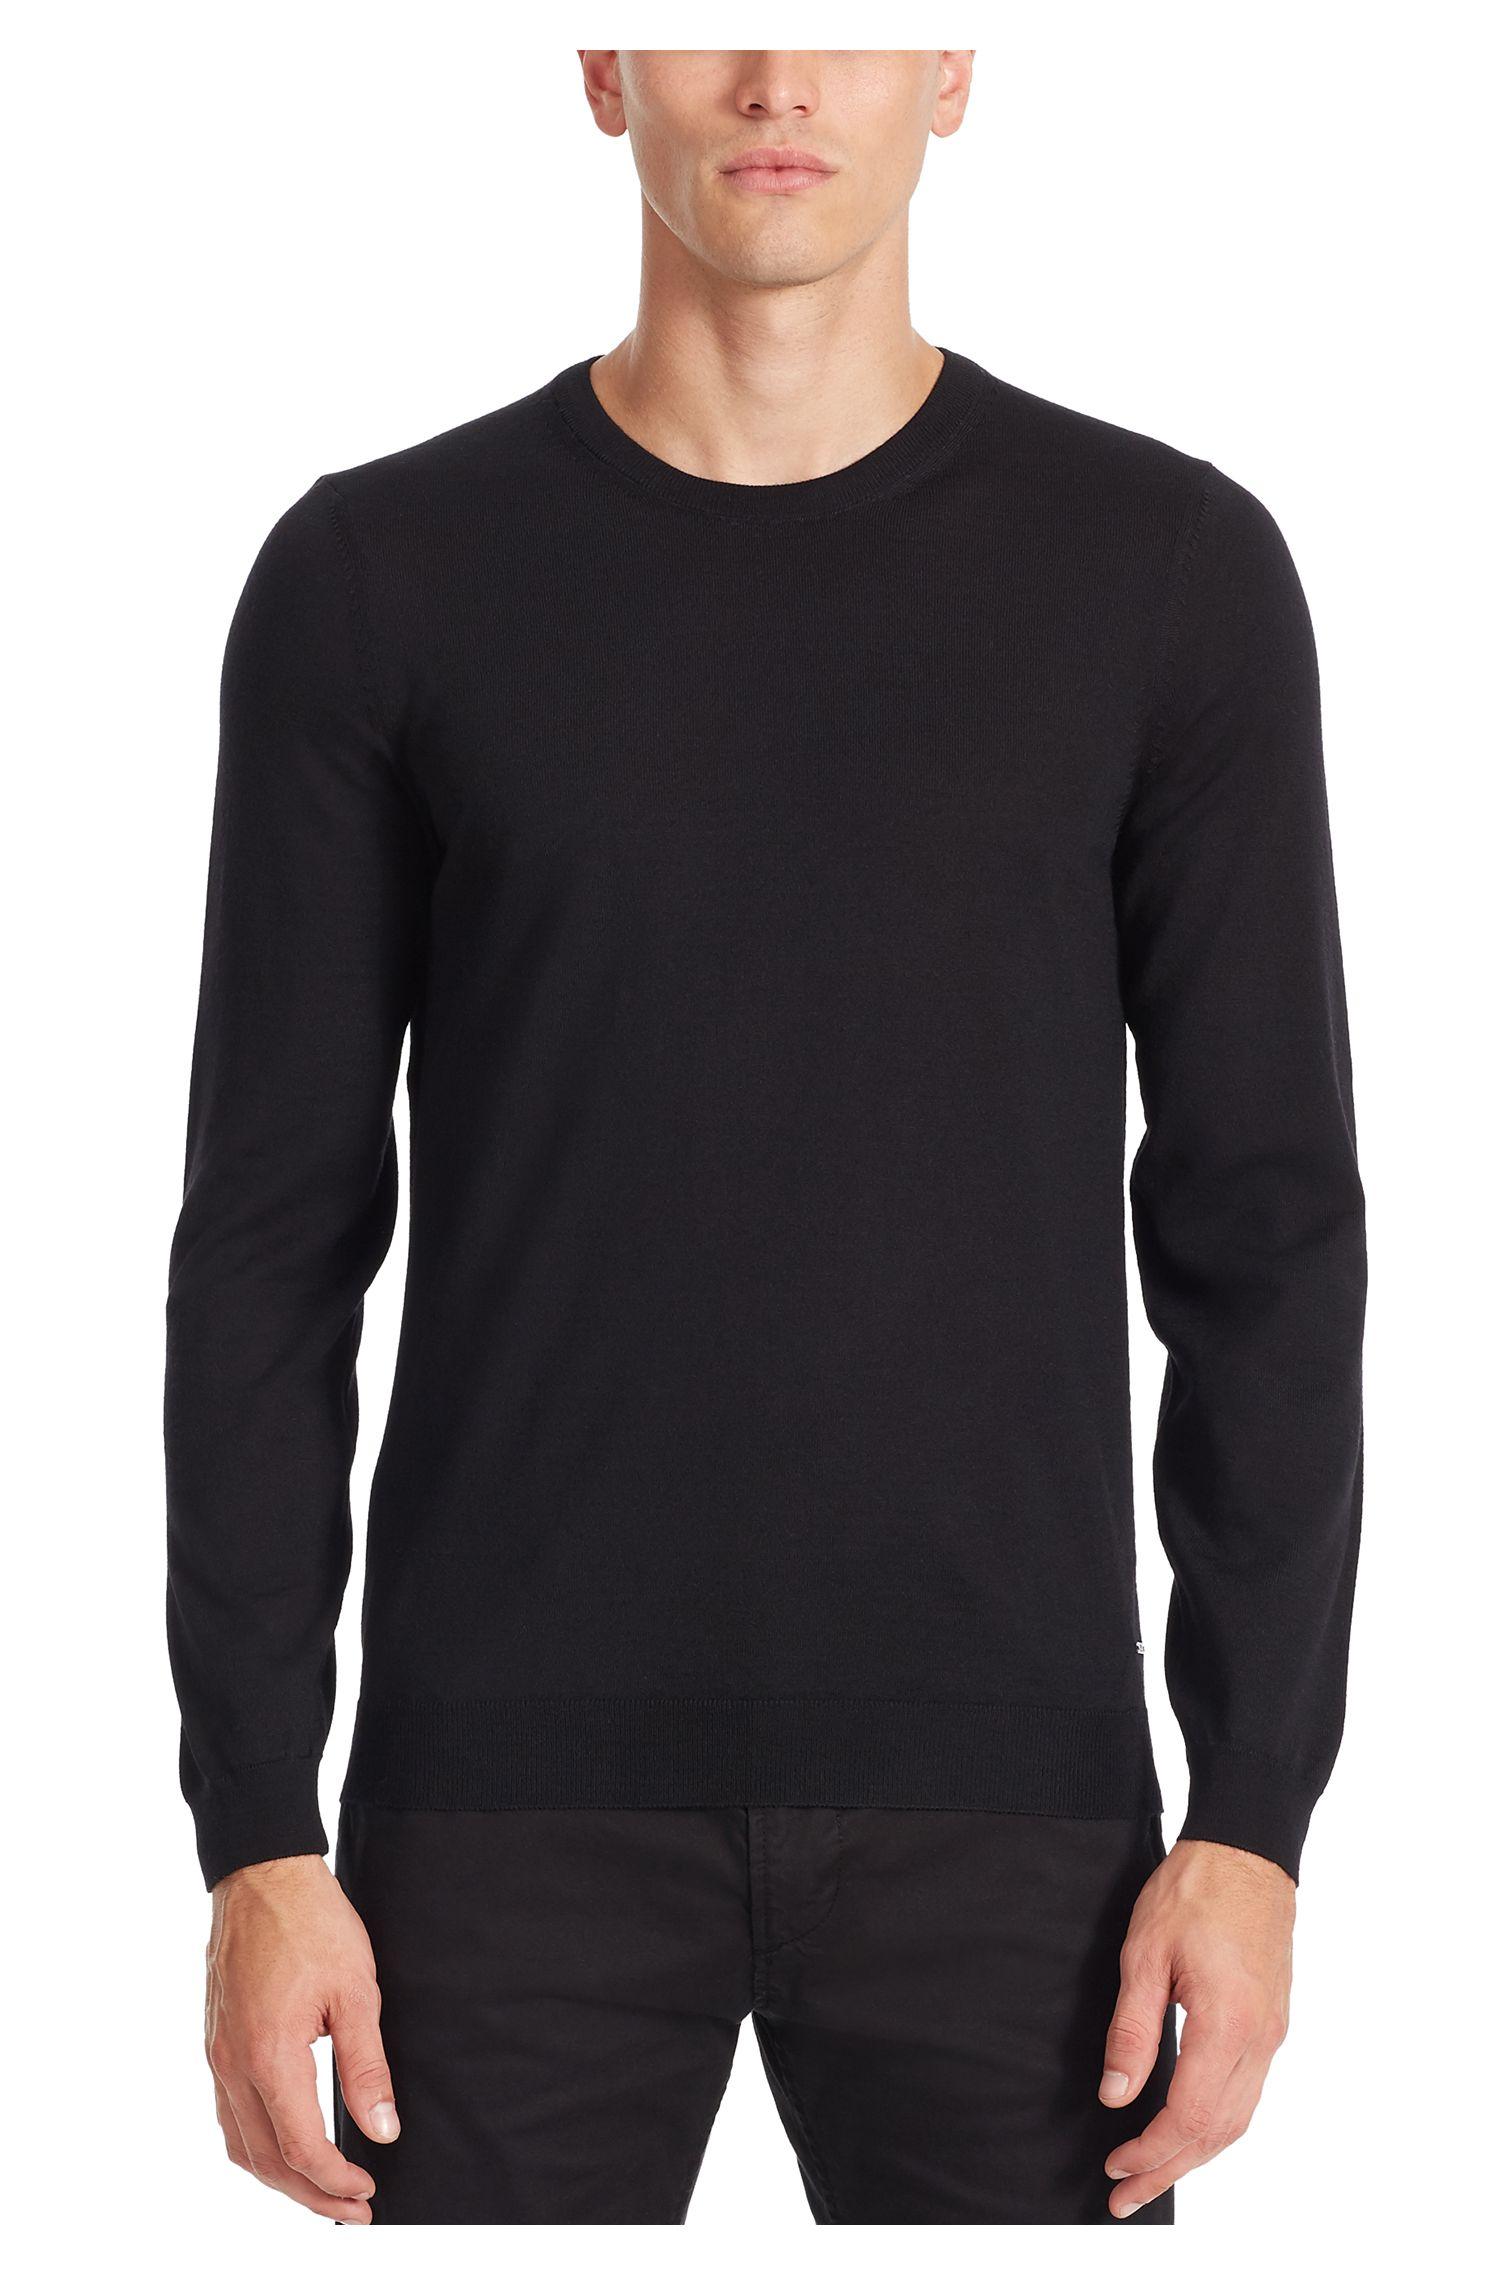 Extra-Fine Merino Wool Sweater | Leno N, Black